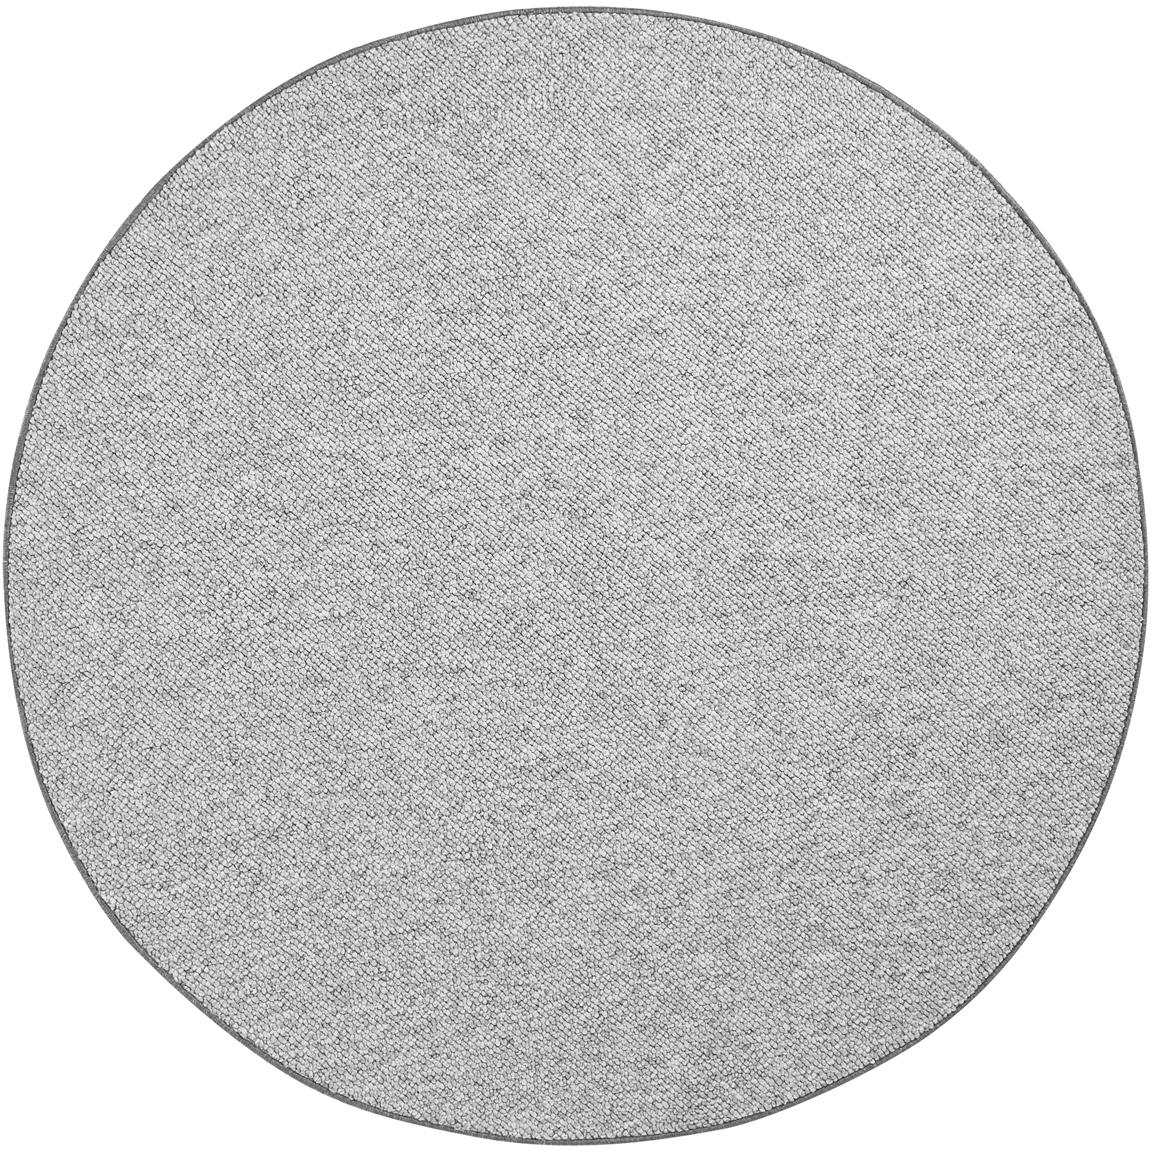 Alfombra redonda de tejido de bolitas Lyon, Parte superior: 100%polipropileno, Reverso: forro polar, Gris jaspeado, Ø 200 cm (Tamaño L)